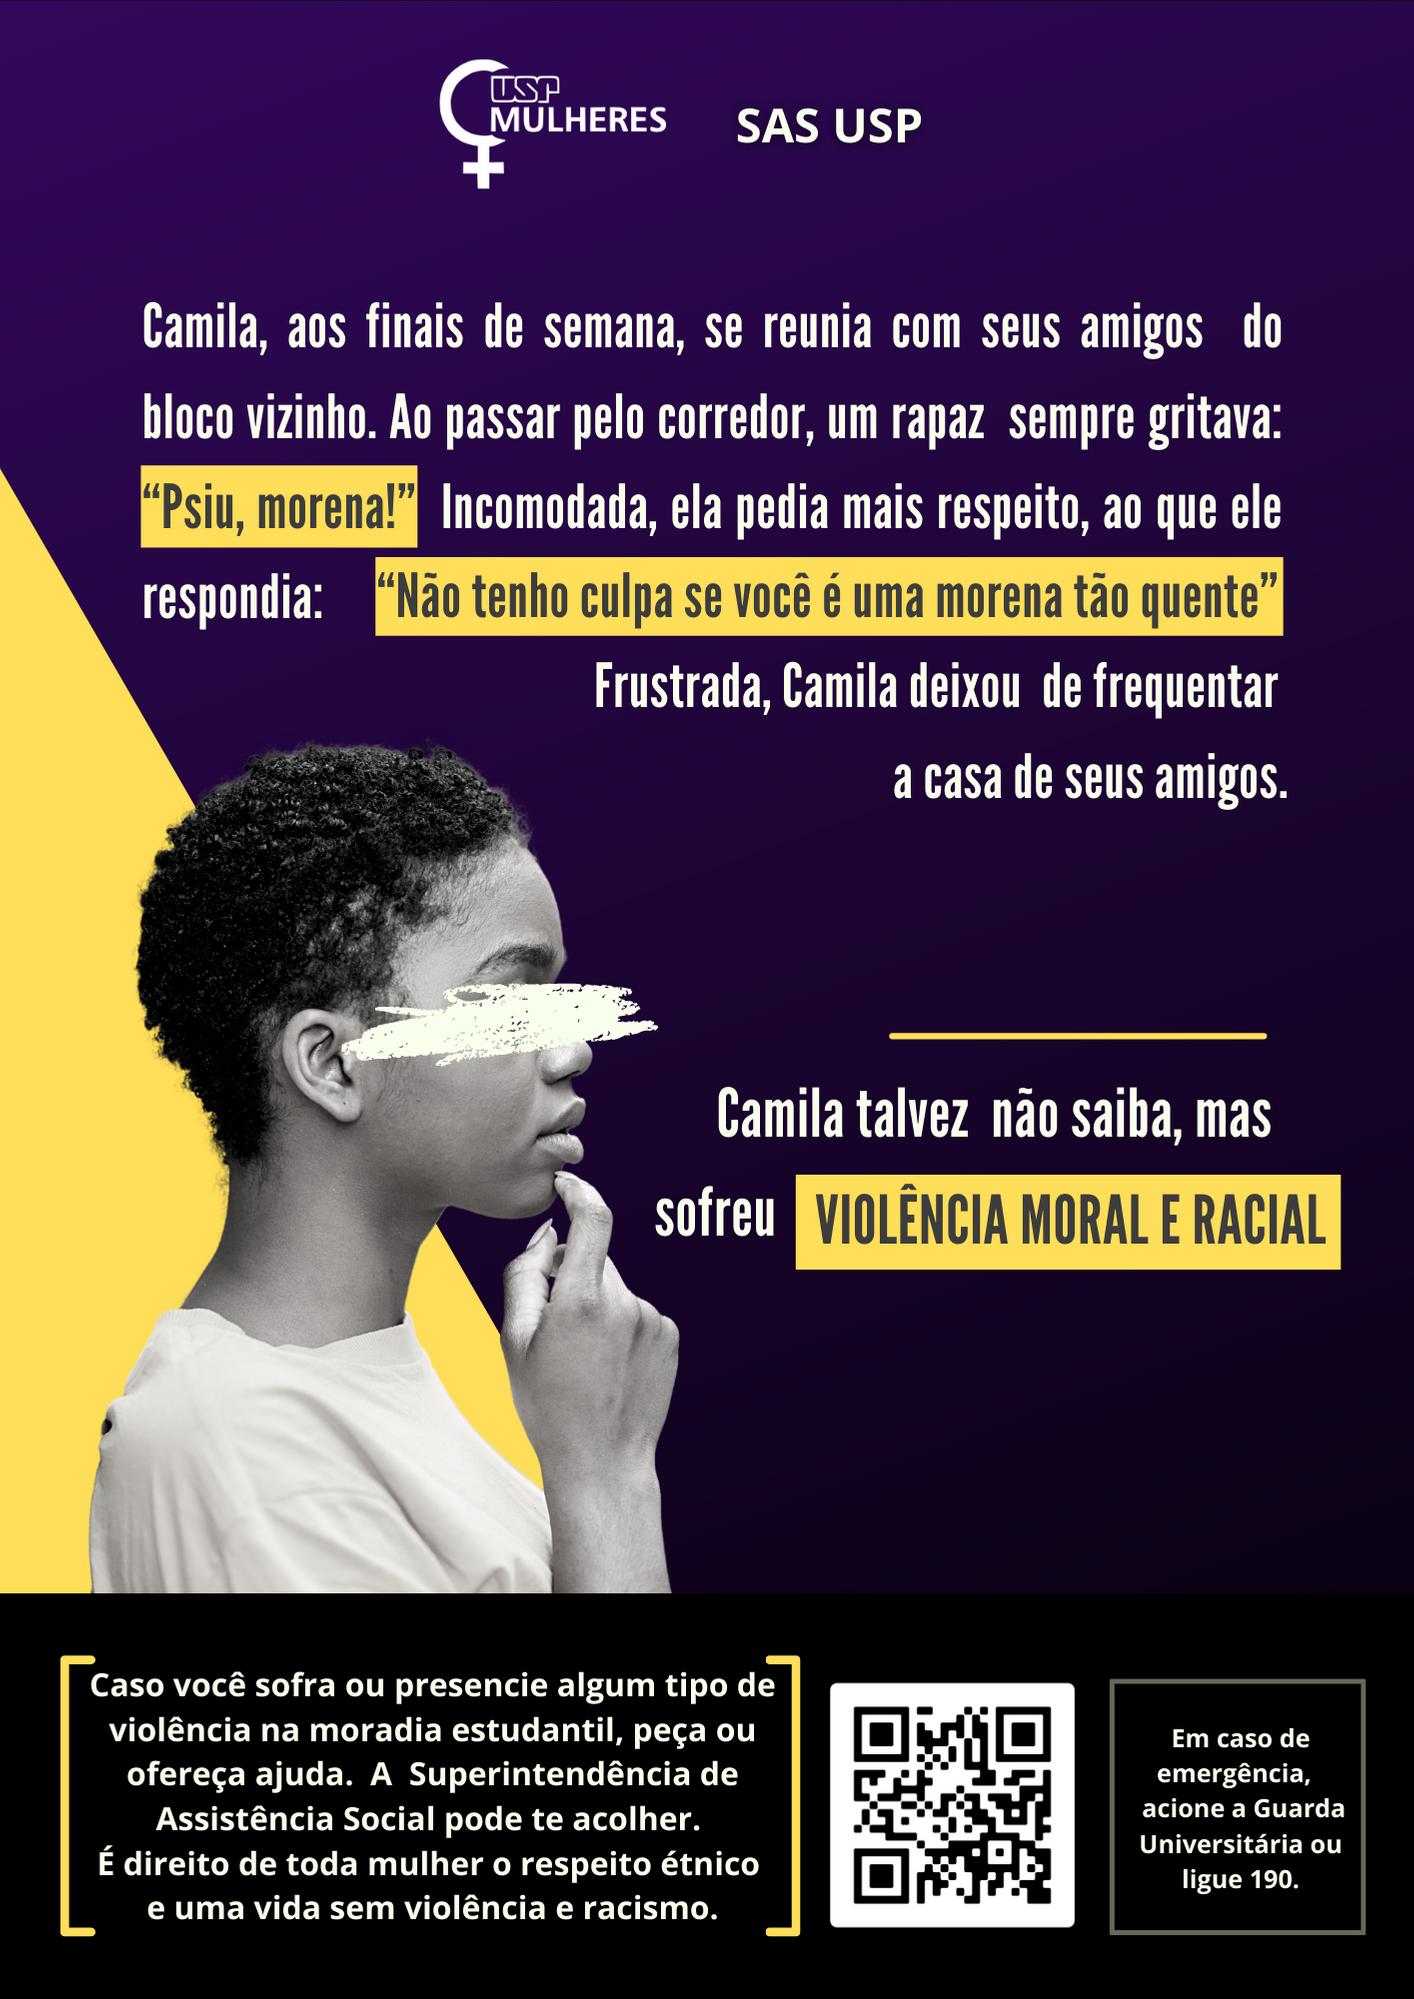 Violência moral e racial